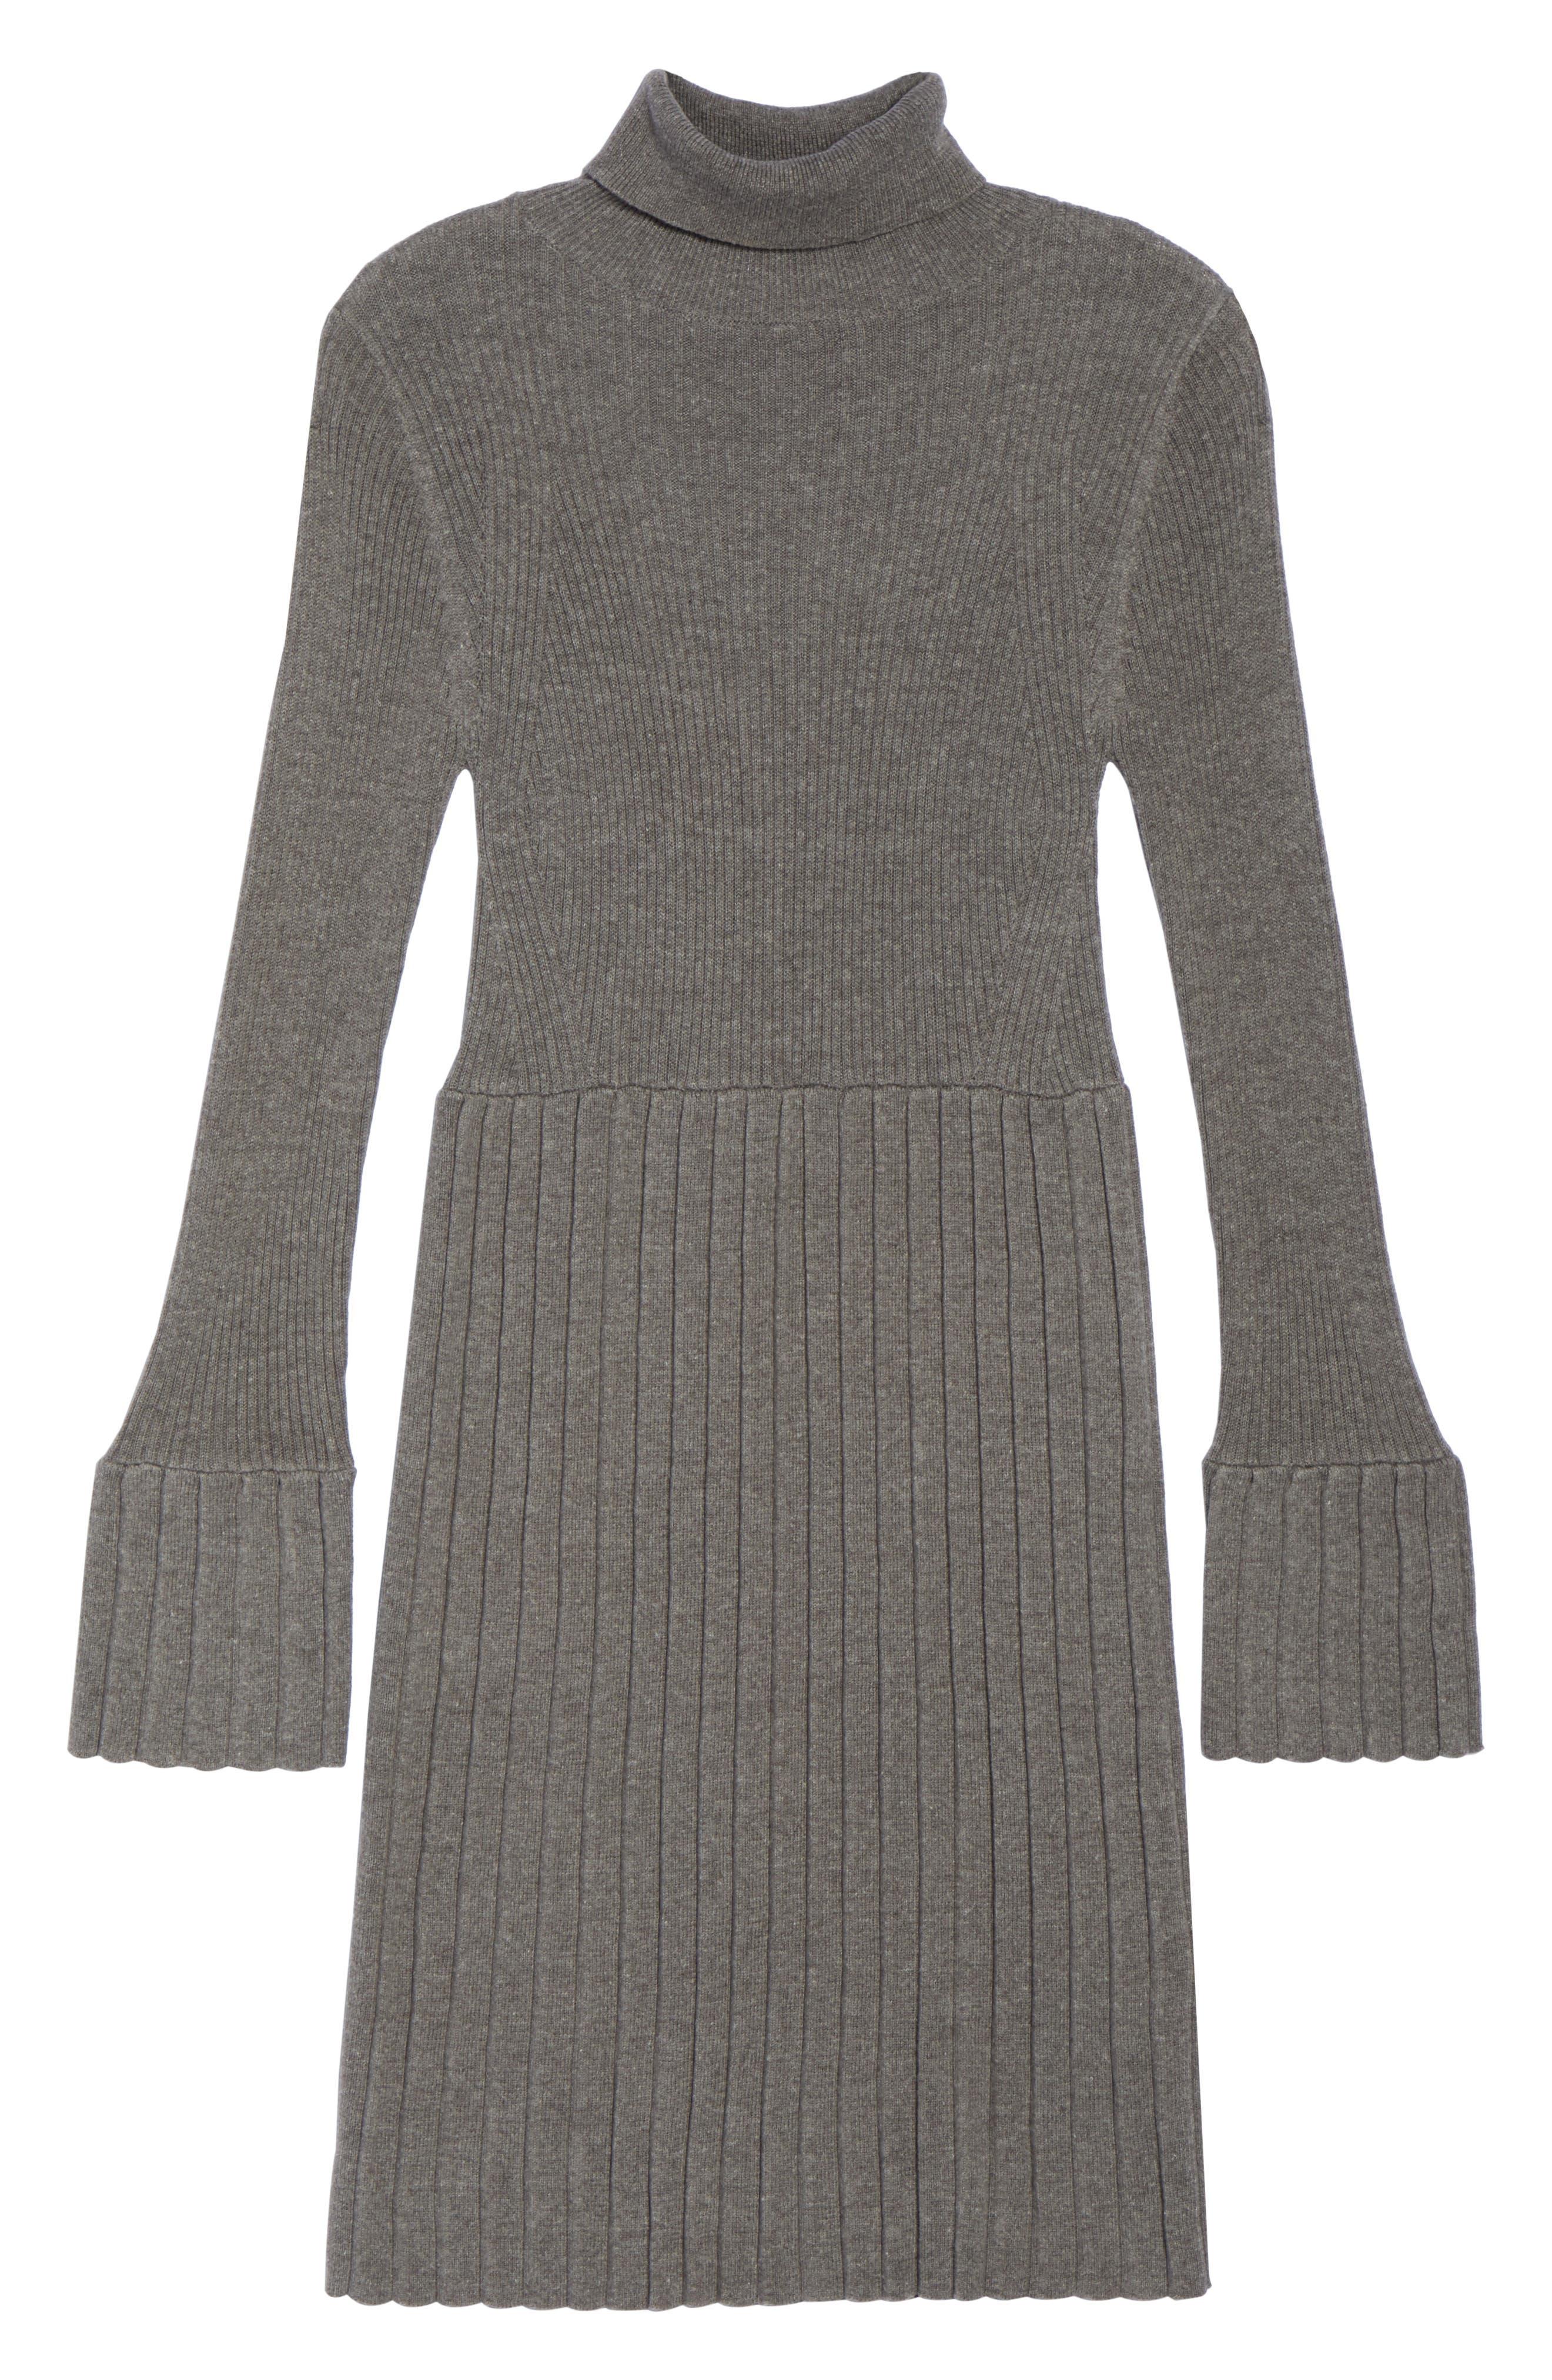 Turtleneck Dress,                             Alternate thumbnail 6, color,                             096